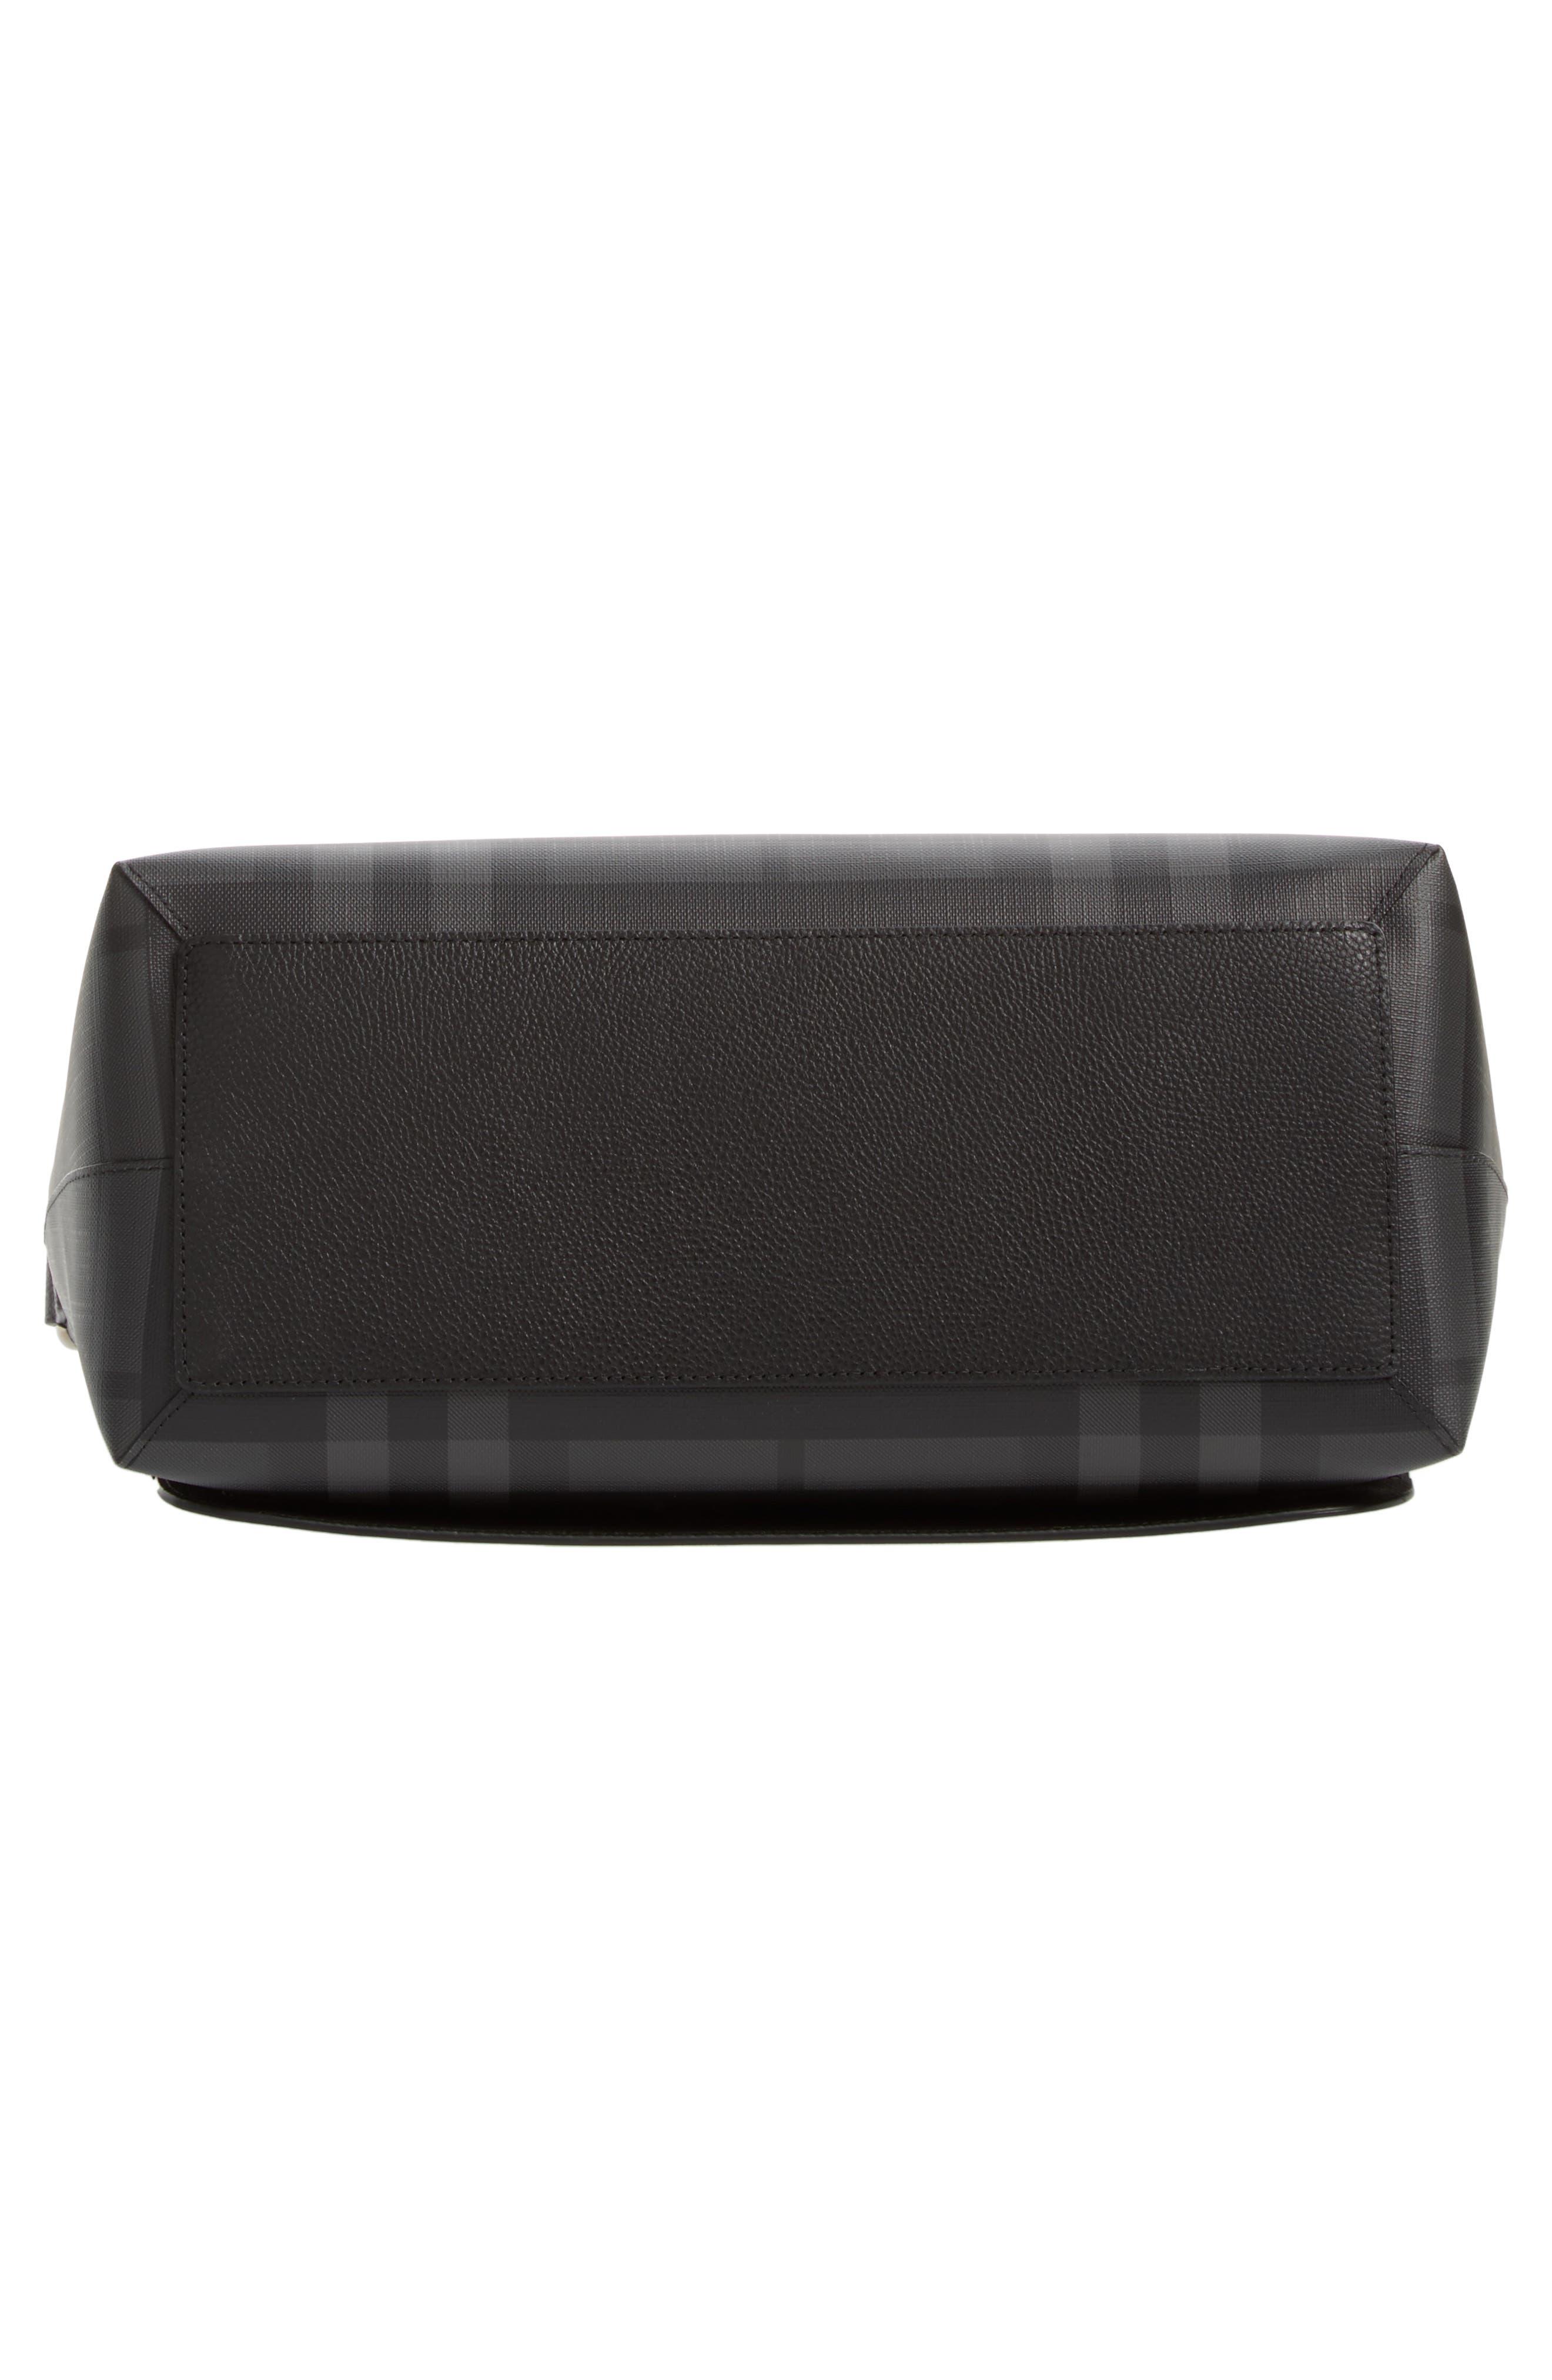 London Check Messenger Bag,                             Alternate thumbnail 6, color,                             Charcoal/ Black